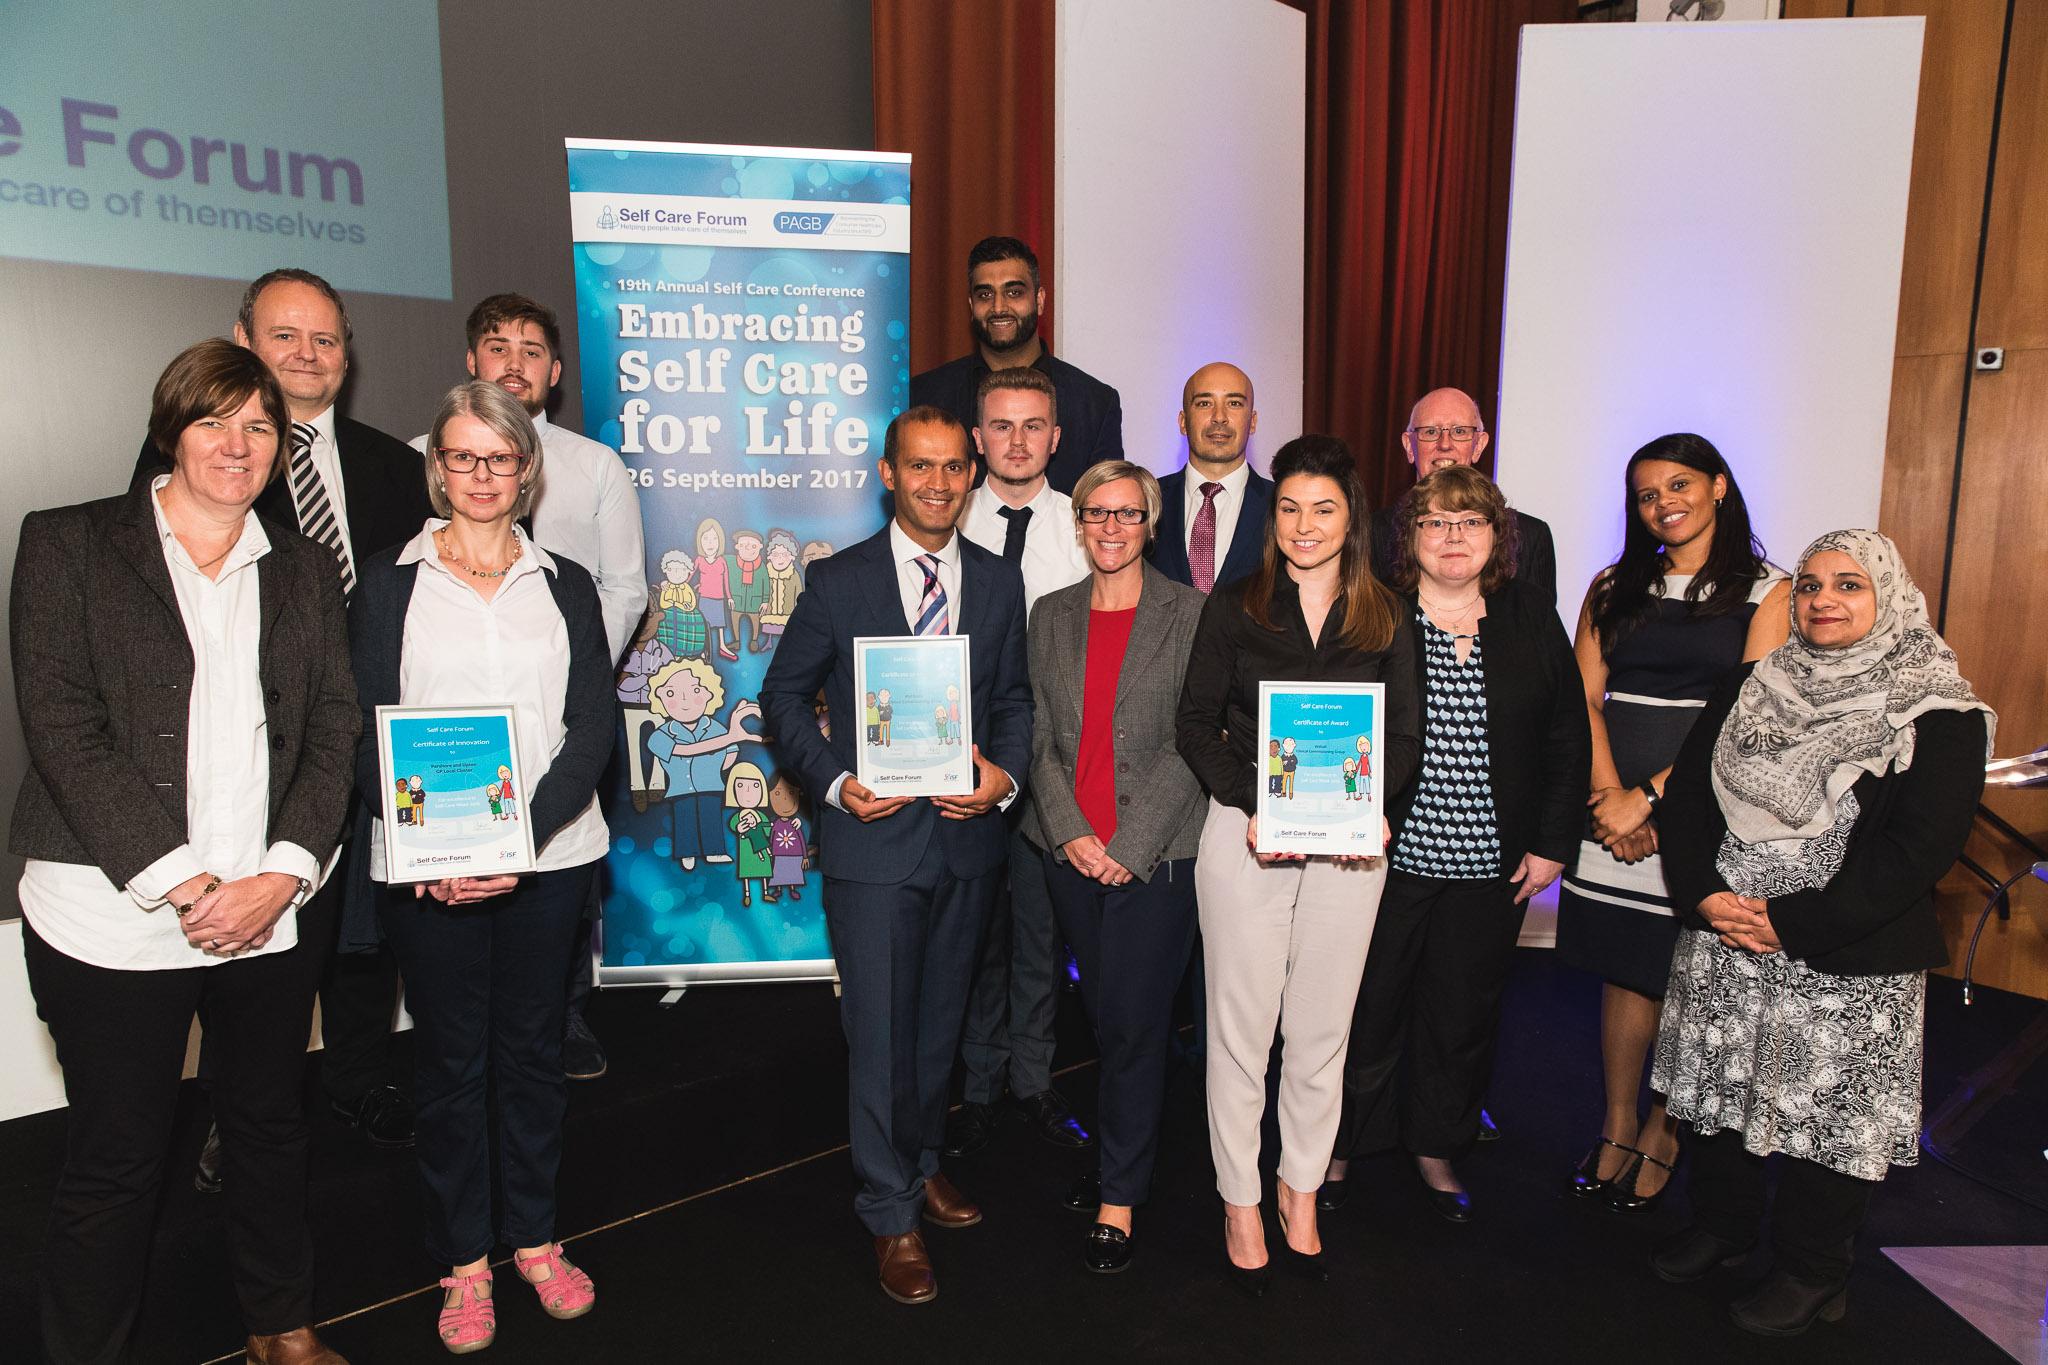 Self Care Week Award 2016 Winners